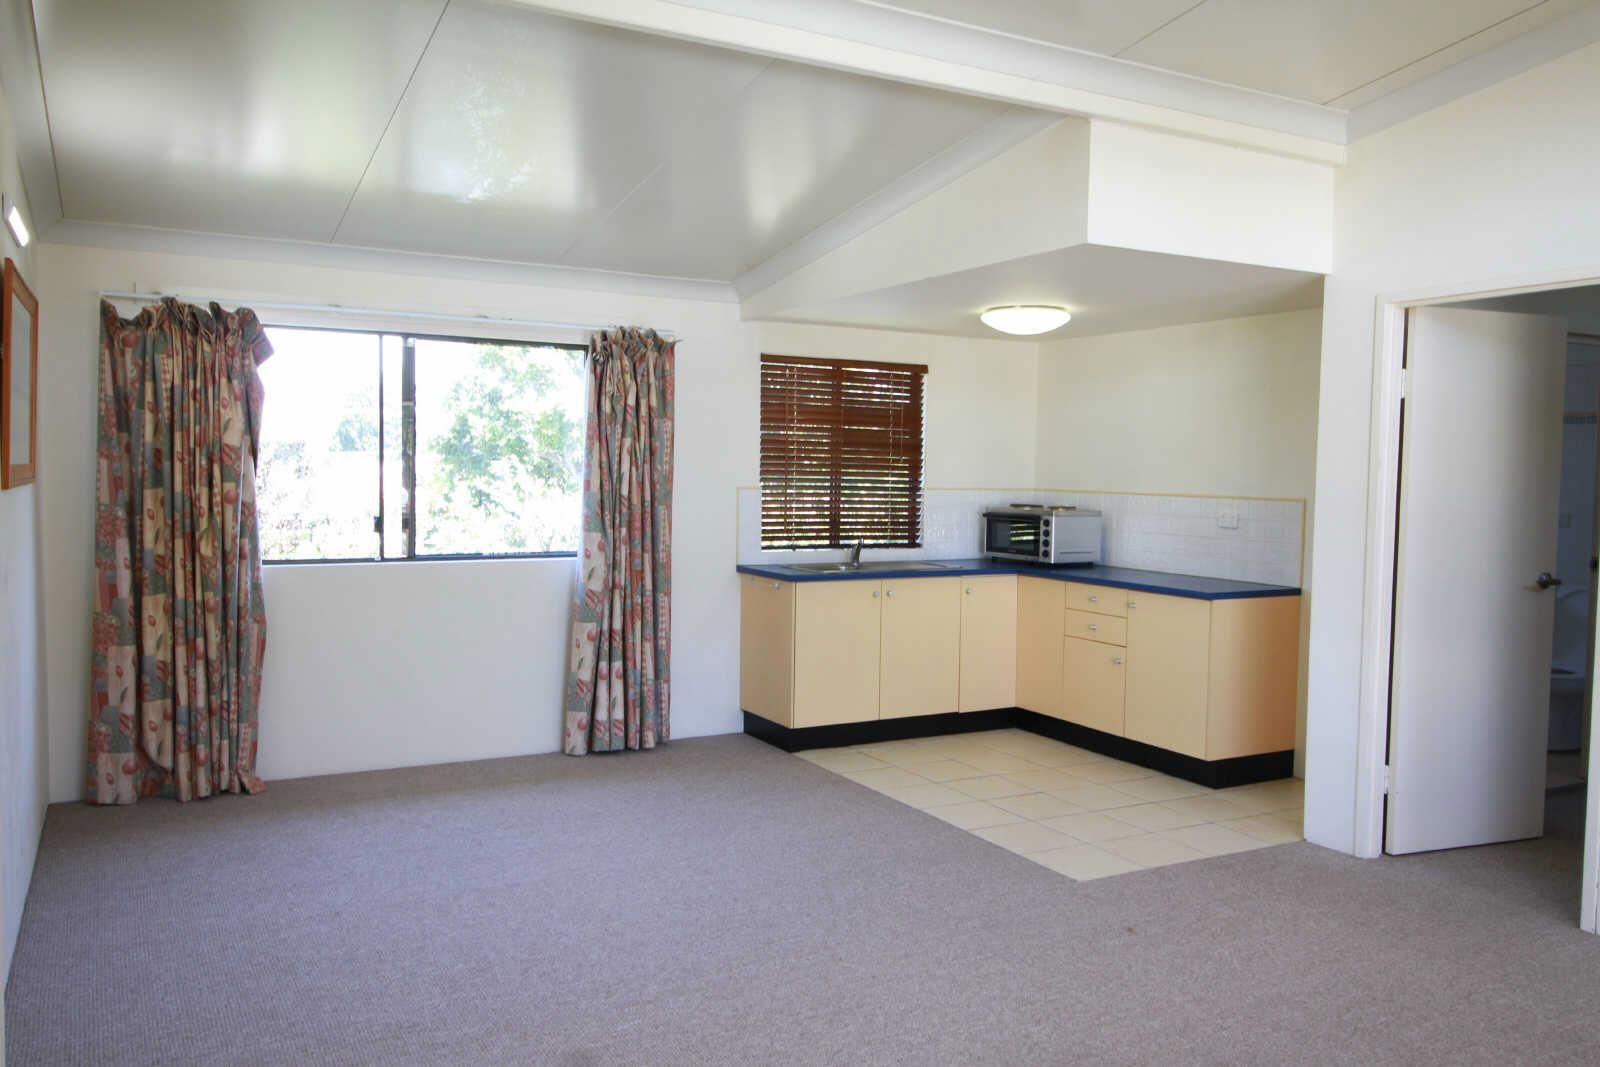 15/91-95 MacIntosh Street, Forster NSW 2428, Image 1